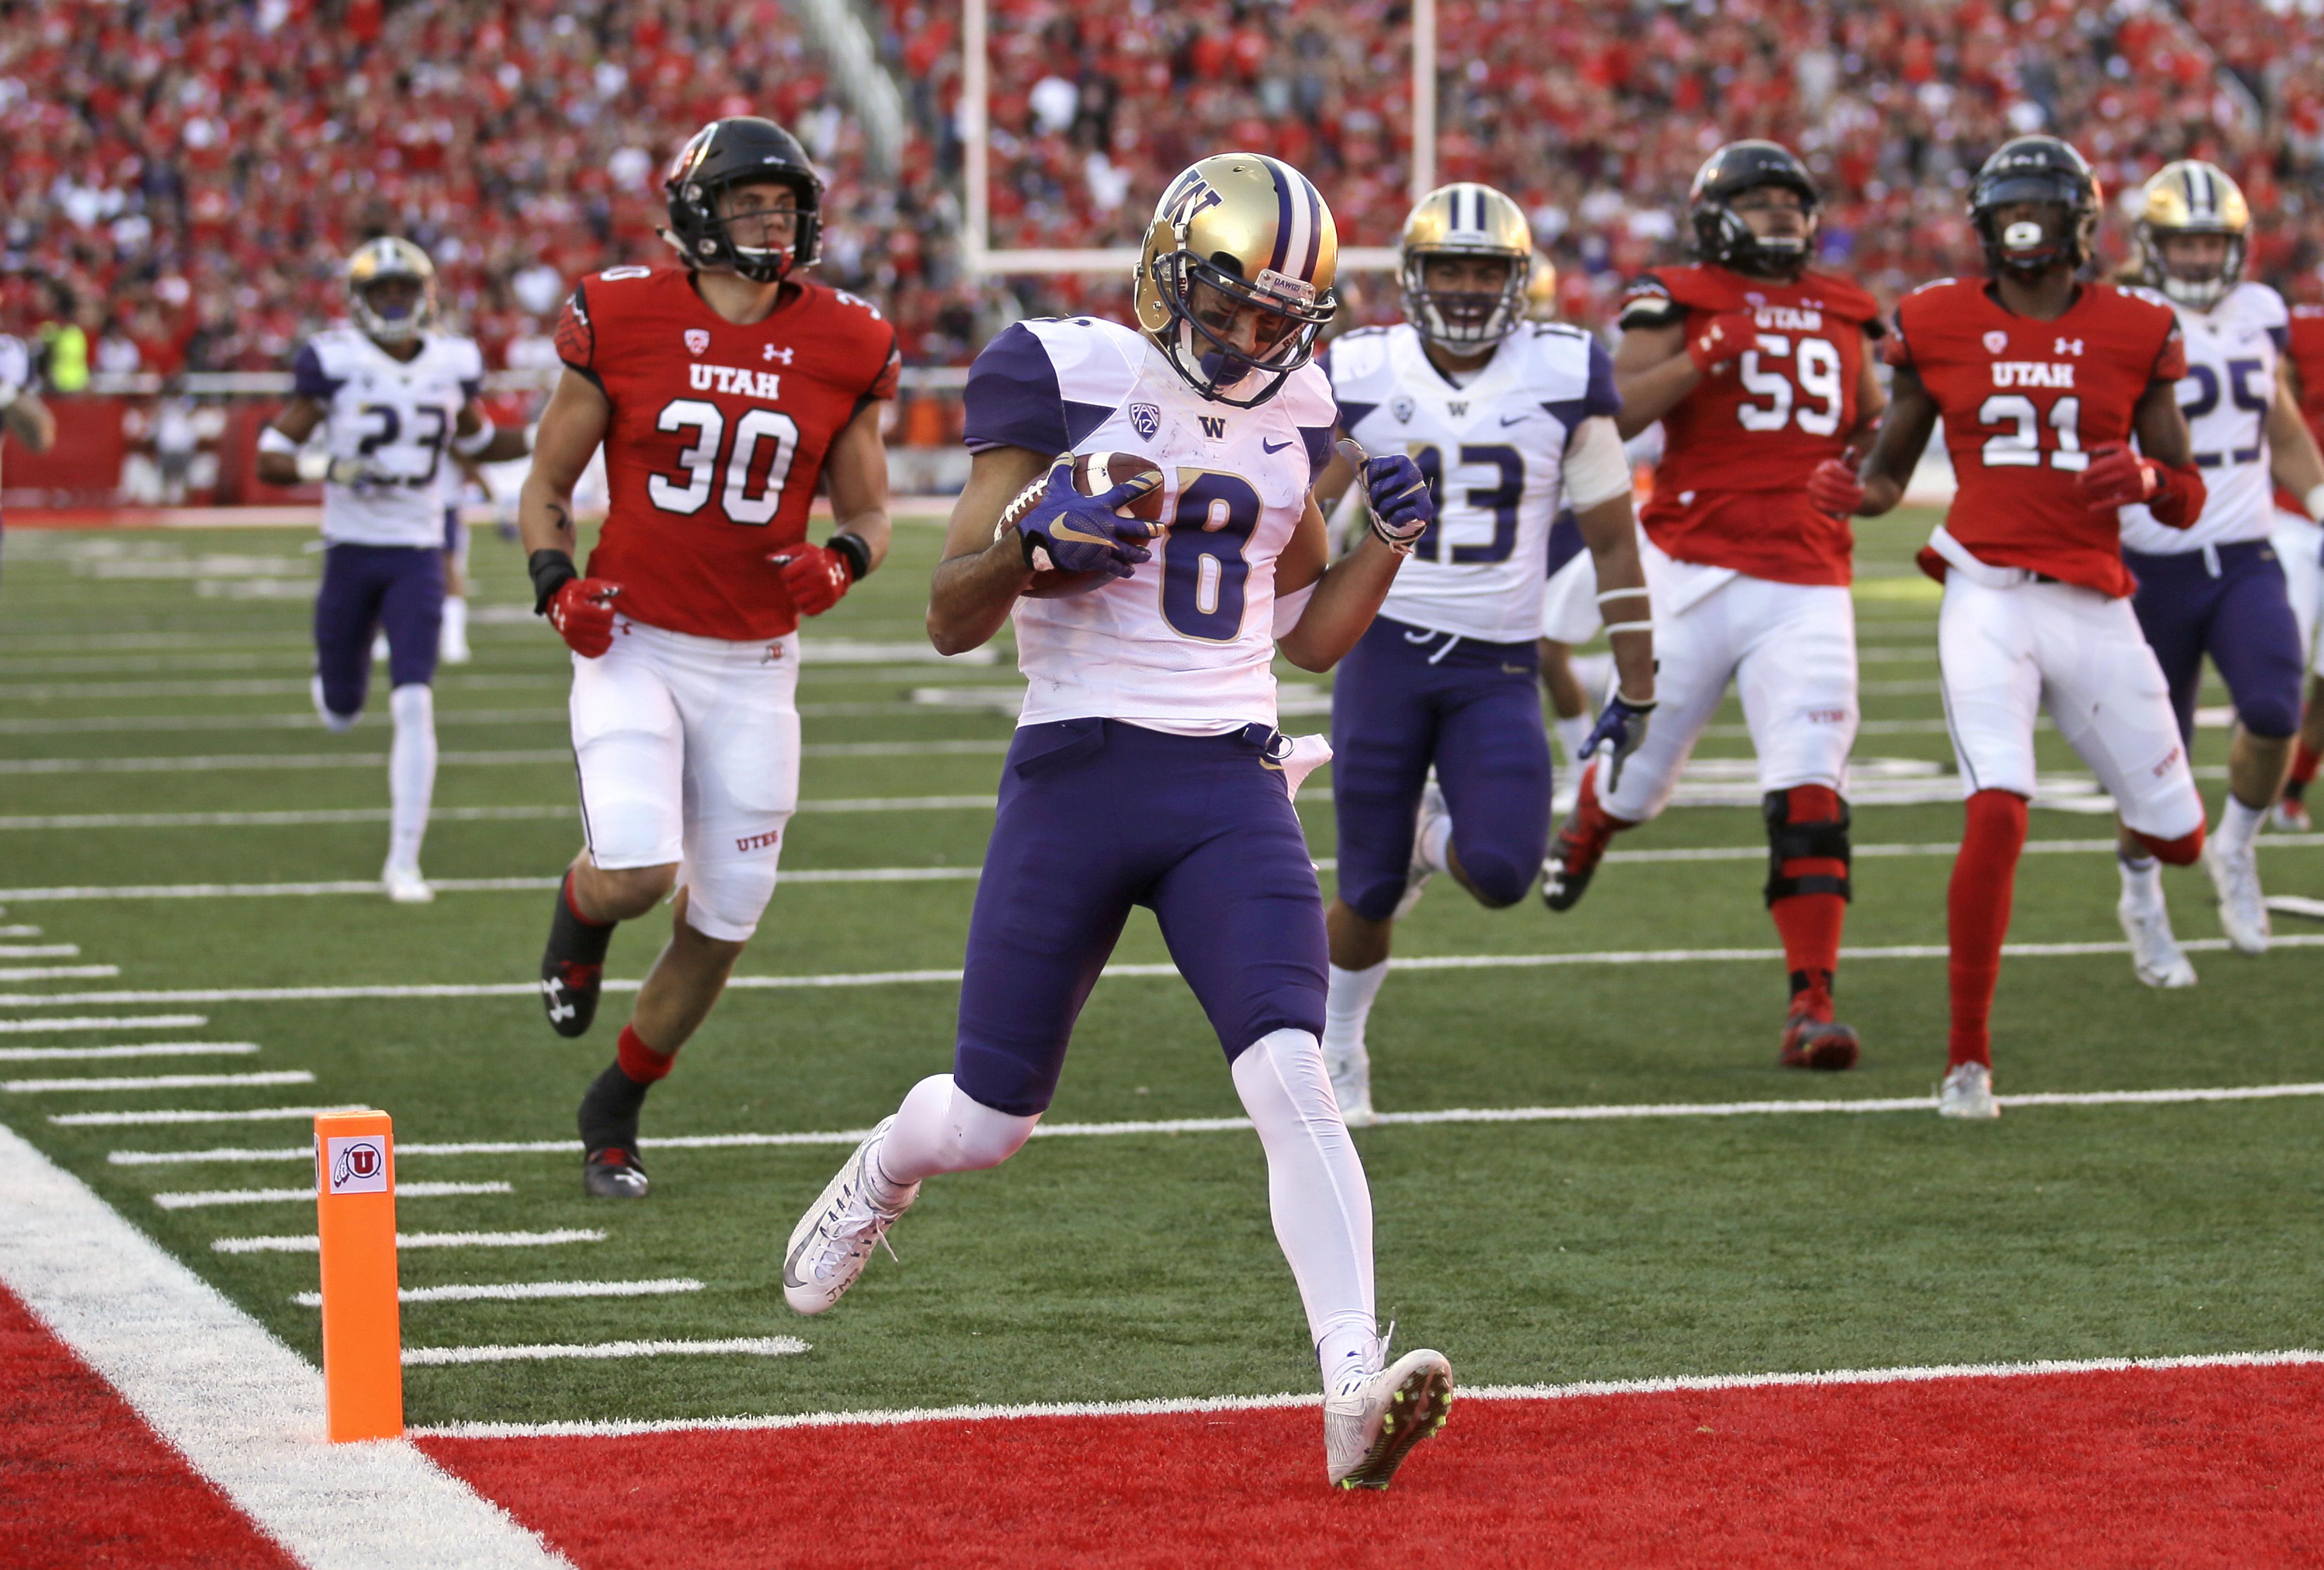 Washington punt returner Dante Pettis (8) scores a touchdown against Utah in the second half of an NCAA college football game, Saturday, Oct. 29, 2016, in Salt Lake City. Washington won 31-24. (AP Photo/Rick Bowmer)